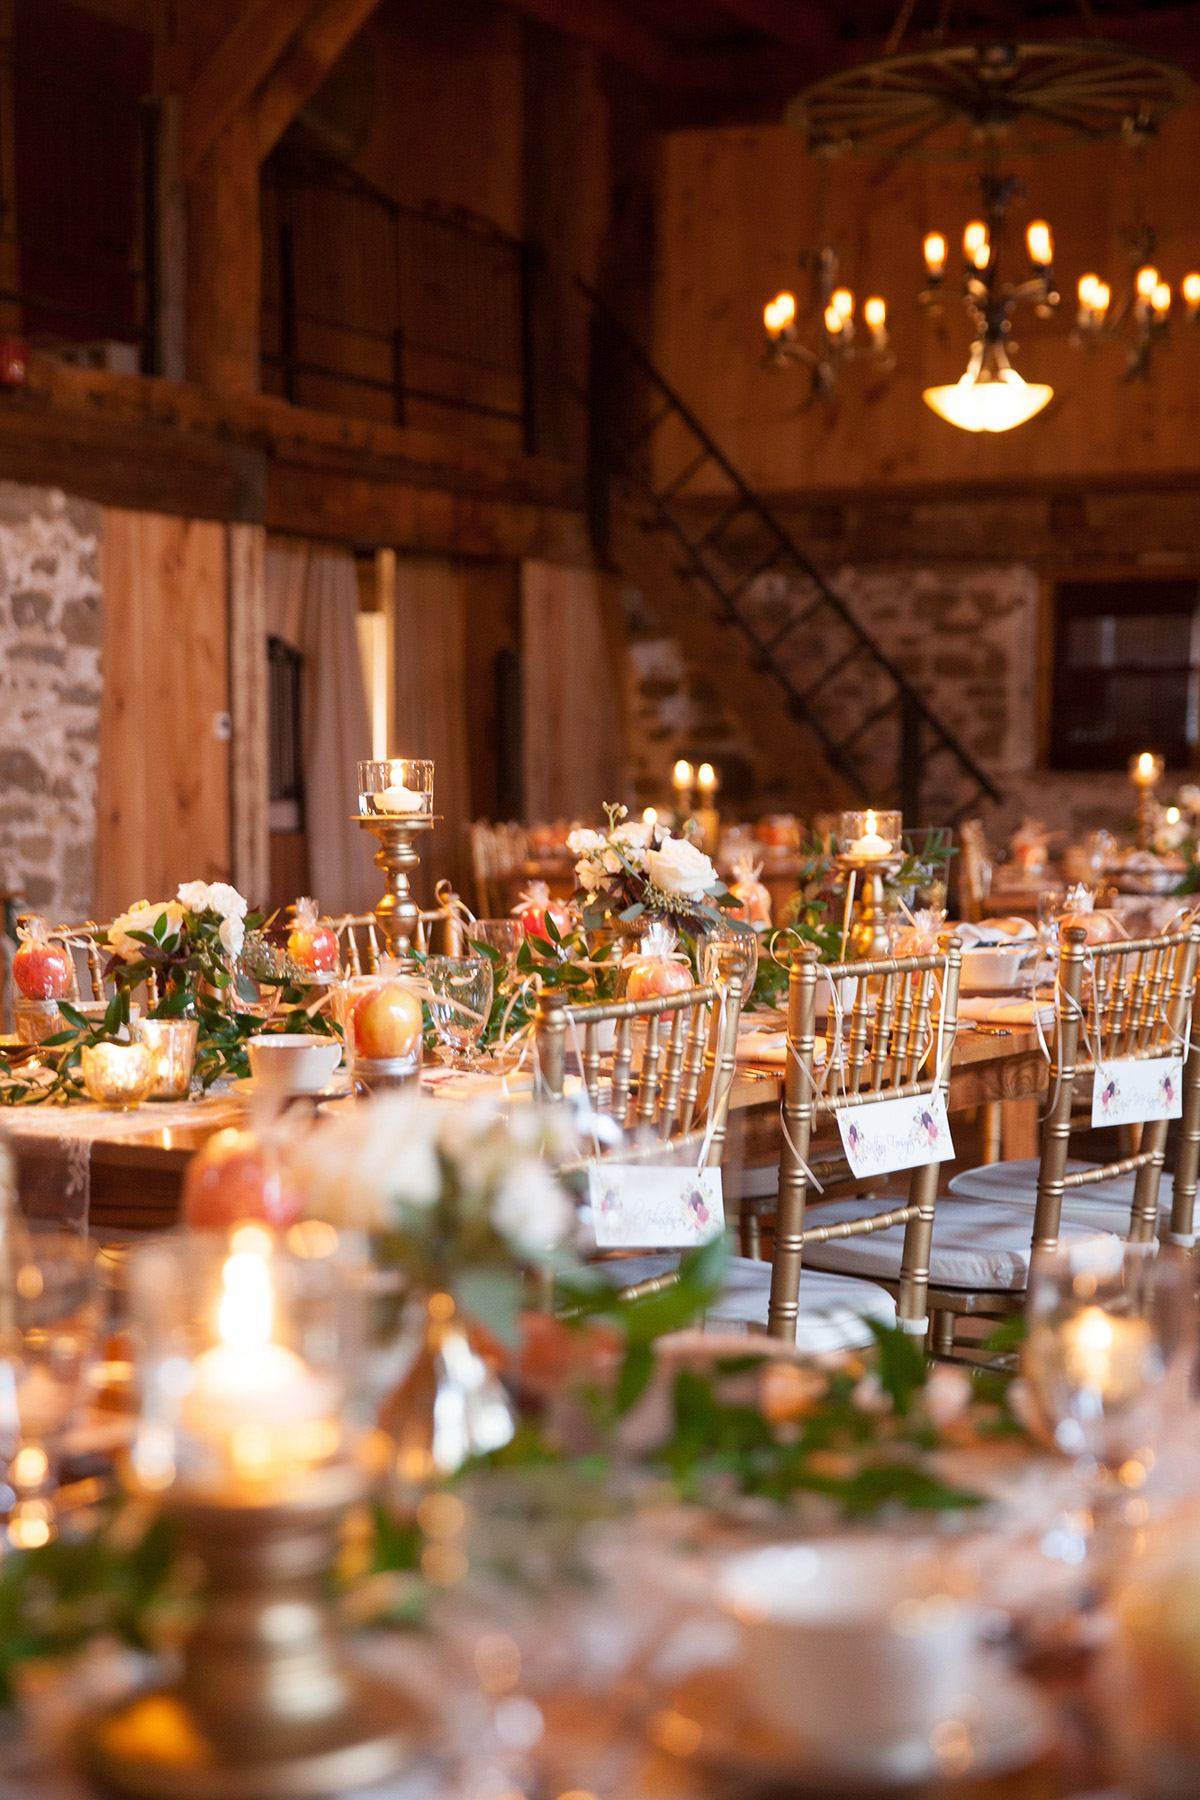 gemini-photography-vineyard-bride-swish-list-honsberger-estates-jordan-wedding-6.jpg